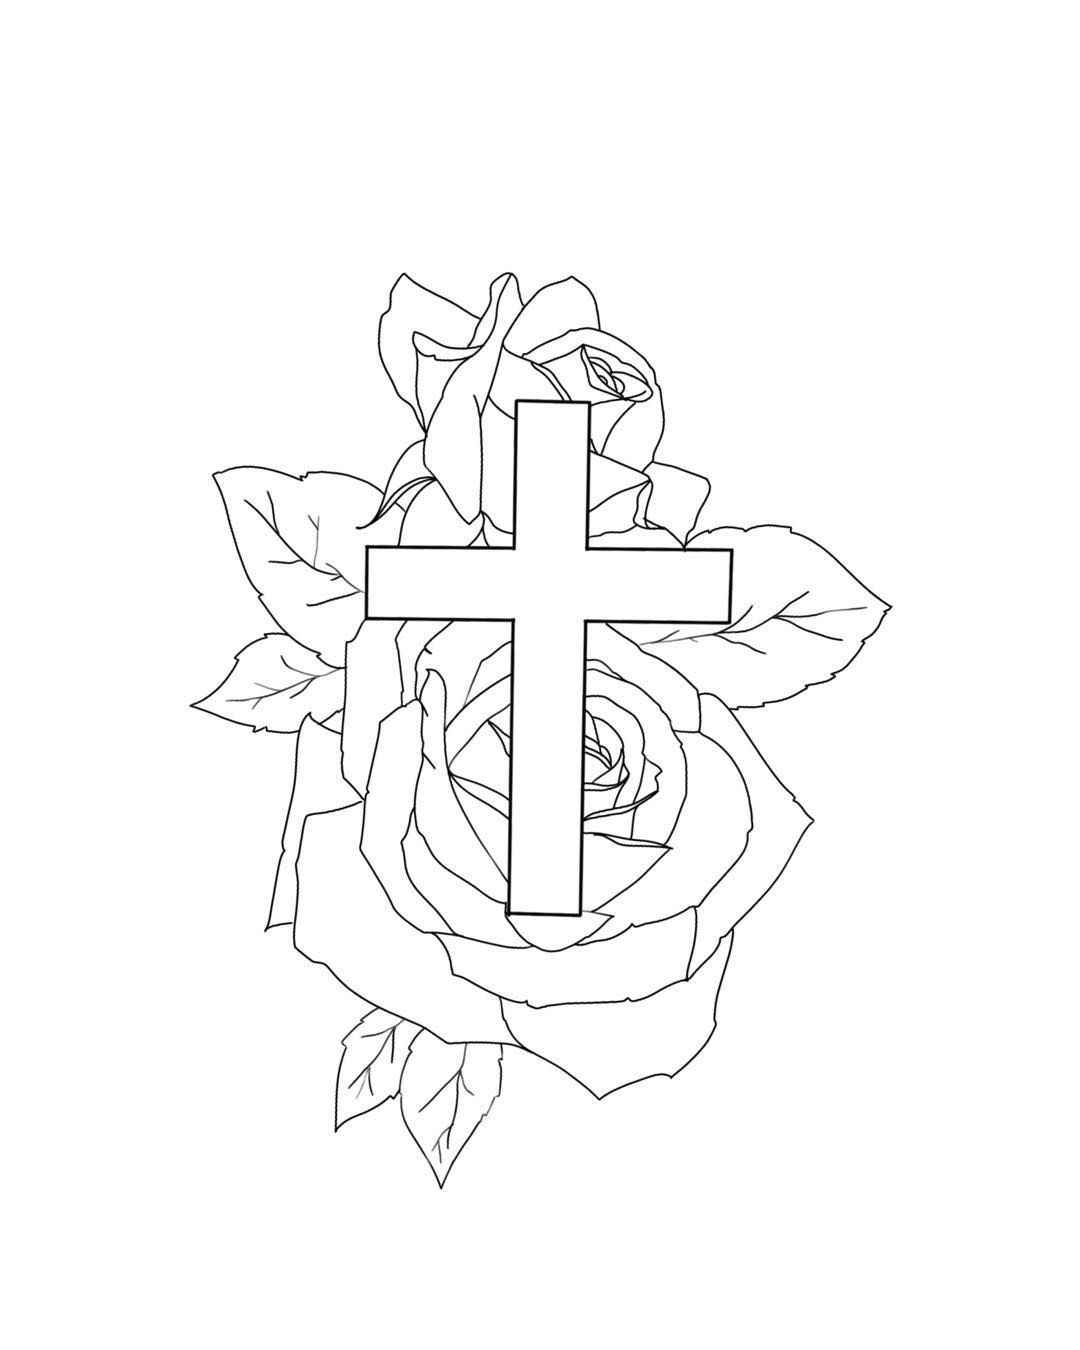 Cross Tattoo Outline : cross, tattoo, outline